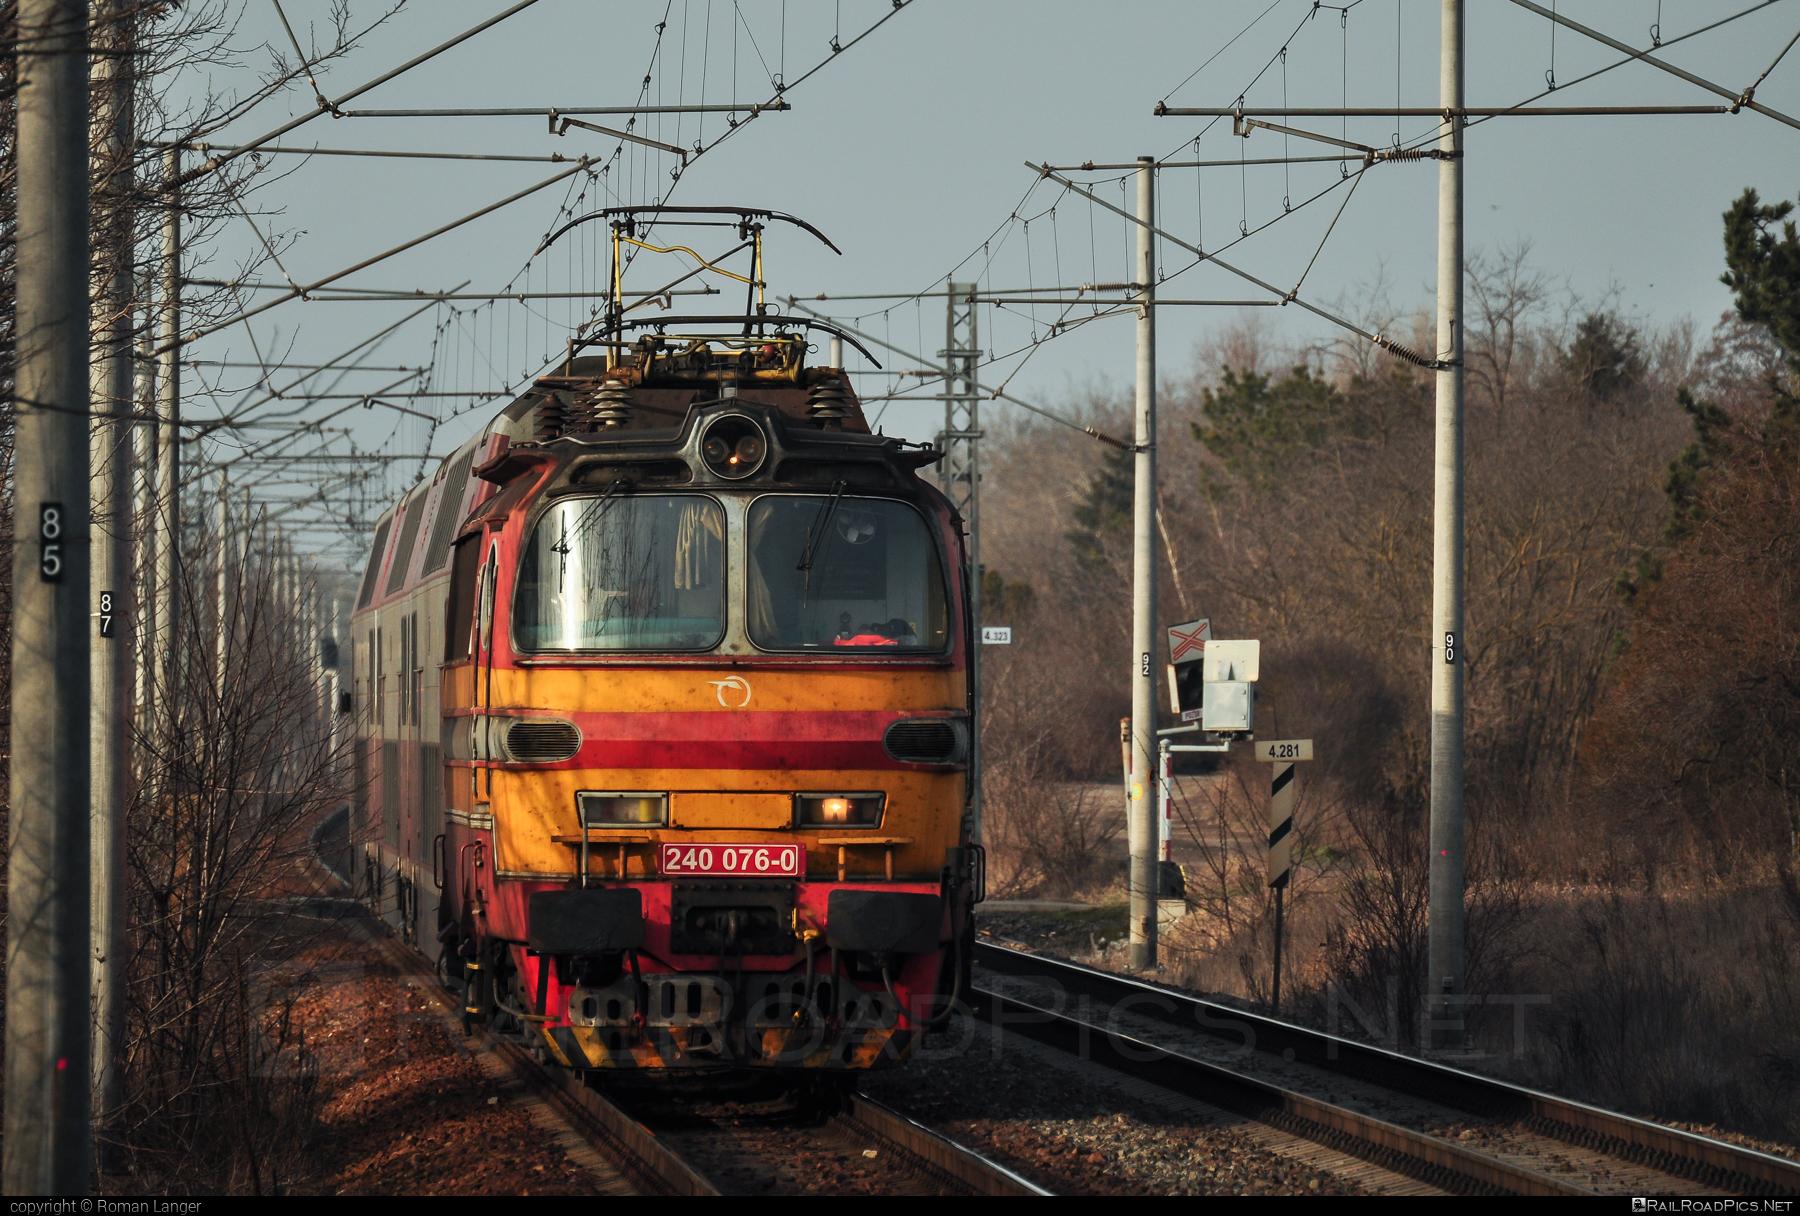 Škoda 47E - 240 076-0 operated by Železničná Spoločnost' Slovensko, a.s. #ZeleznicnaSpolocnostSlovensko #laminatka #locomotive240 #skoda #skoda47e #zssk